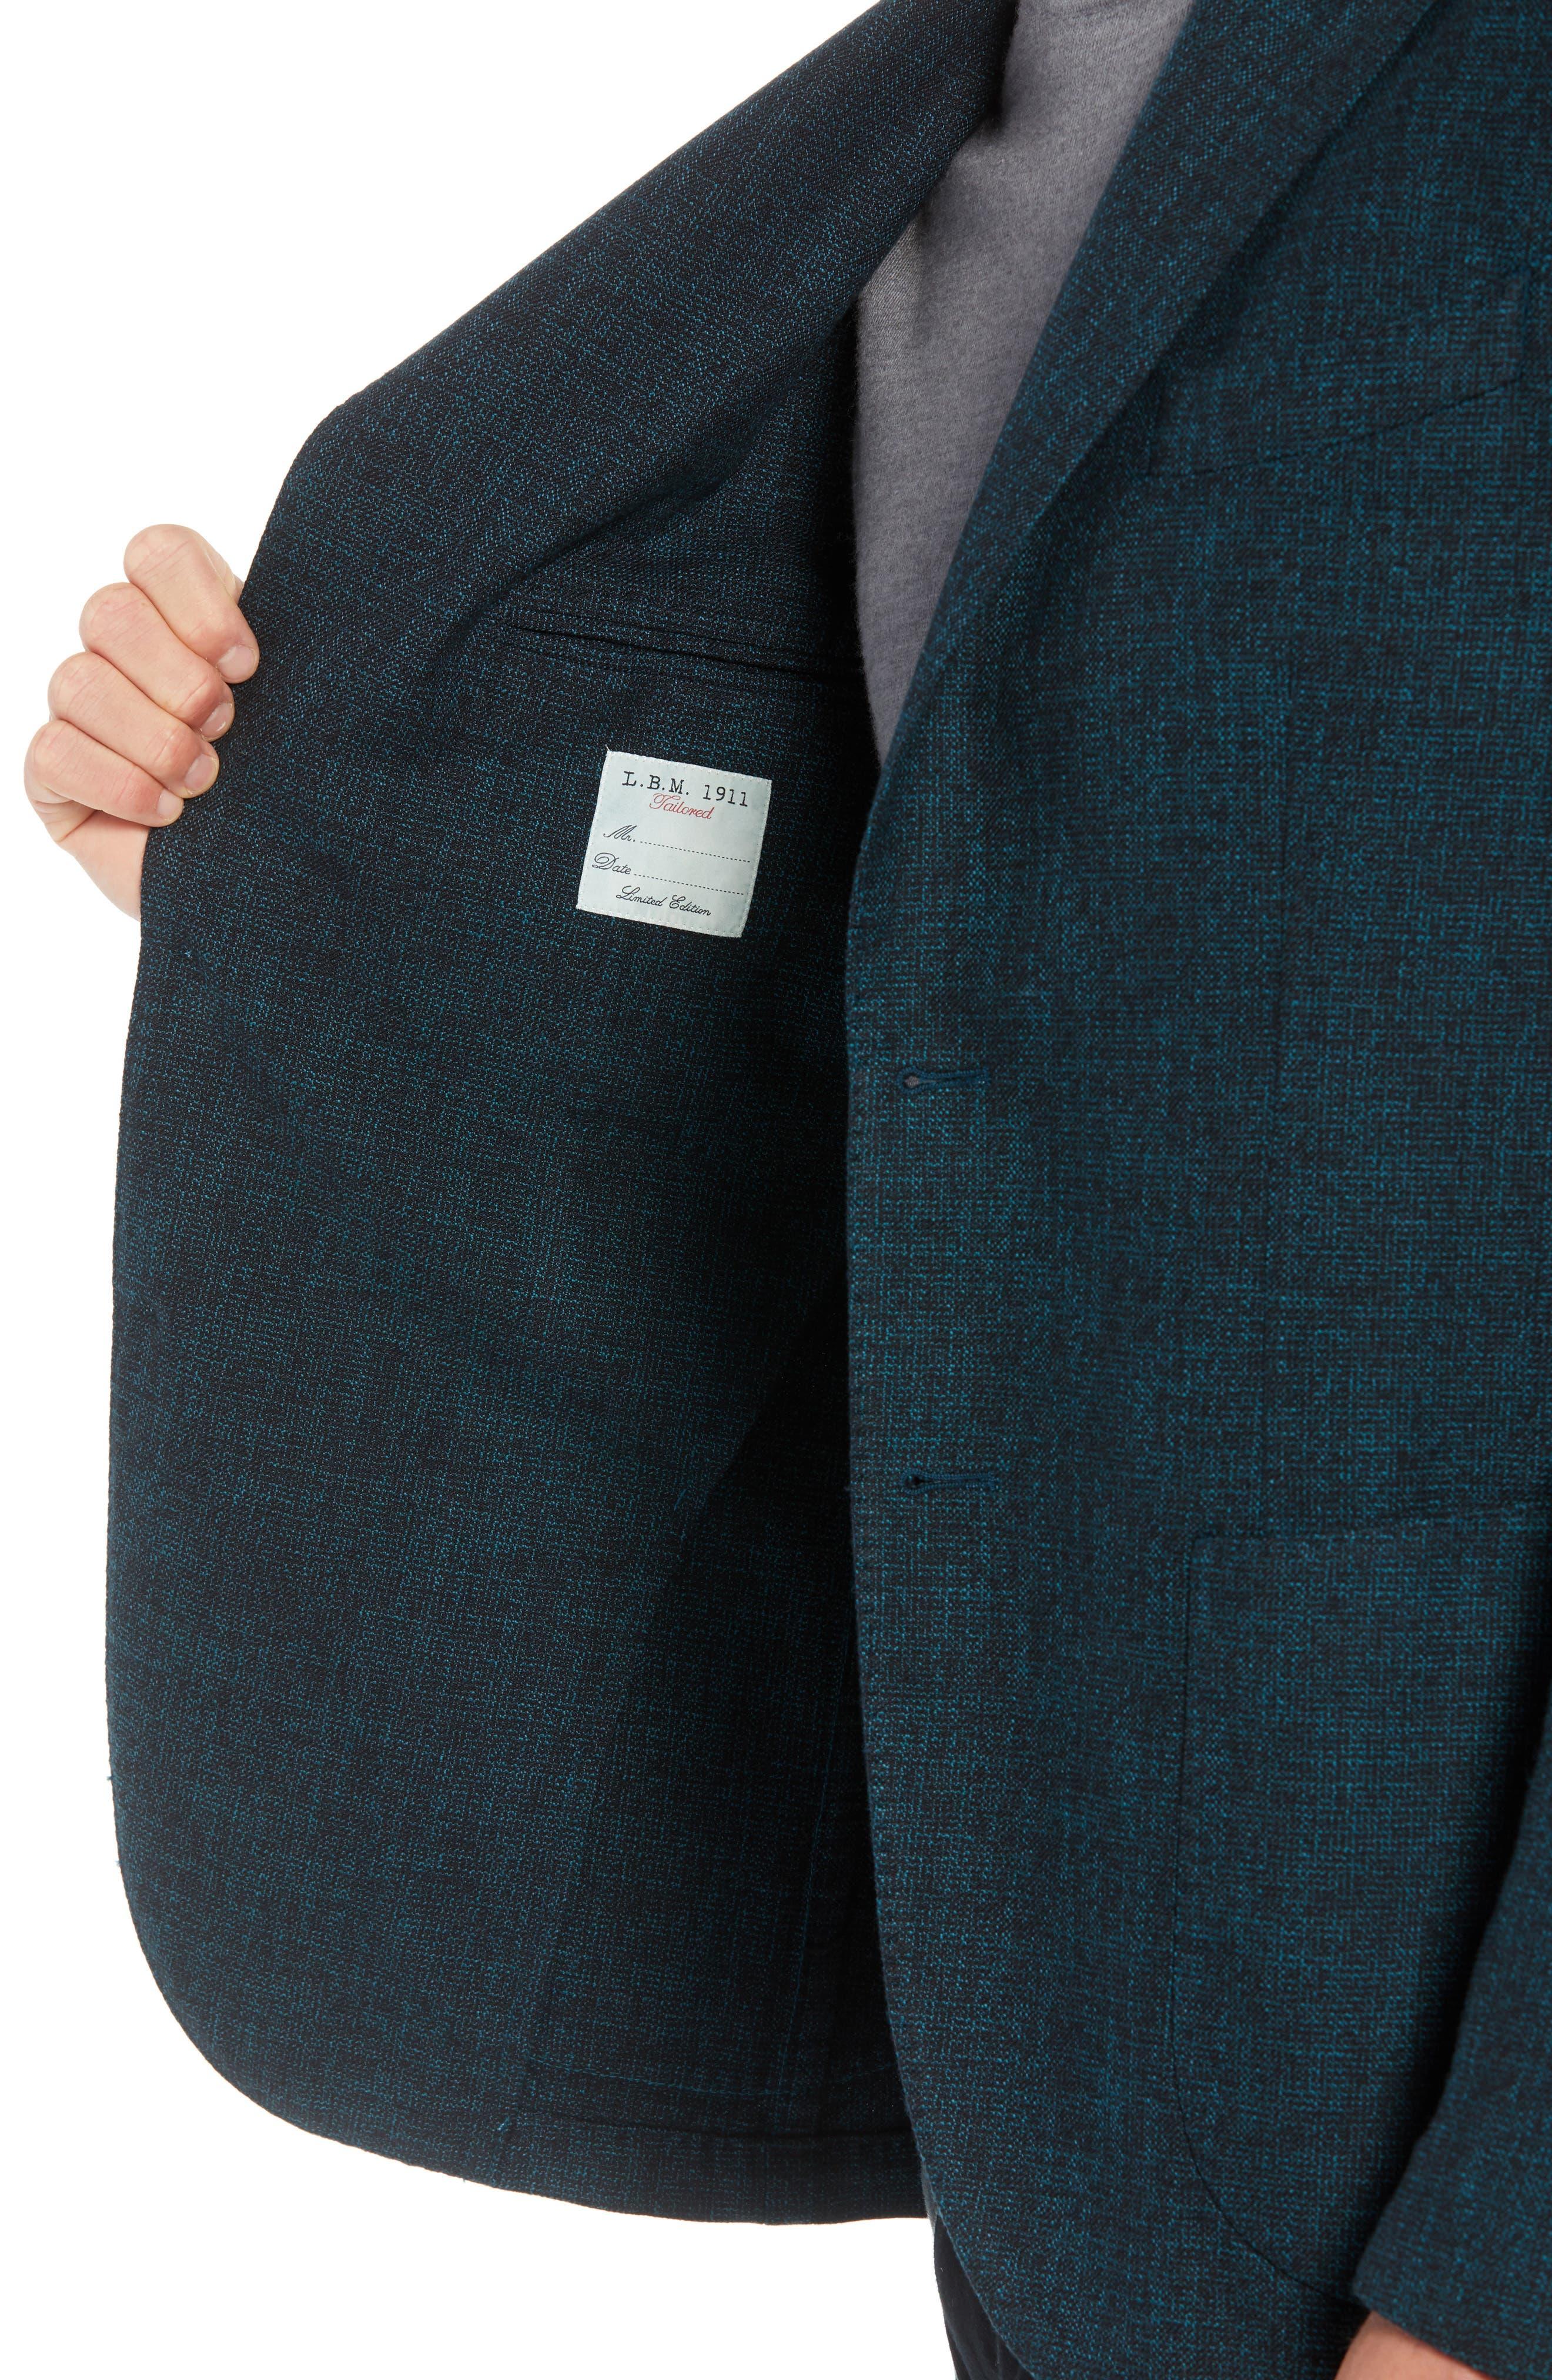 L.B.M 1911 Classic Fit Cotton & Wool Blazer,                             Alternate thumbnail 4, color,                             GREEN